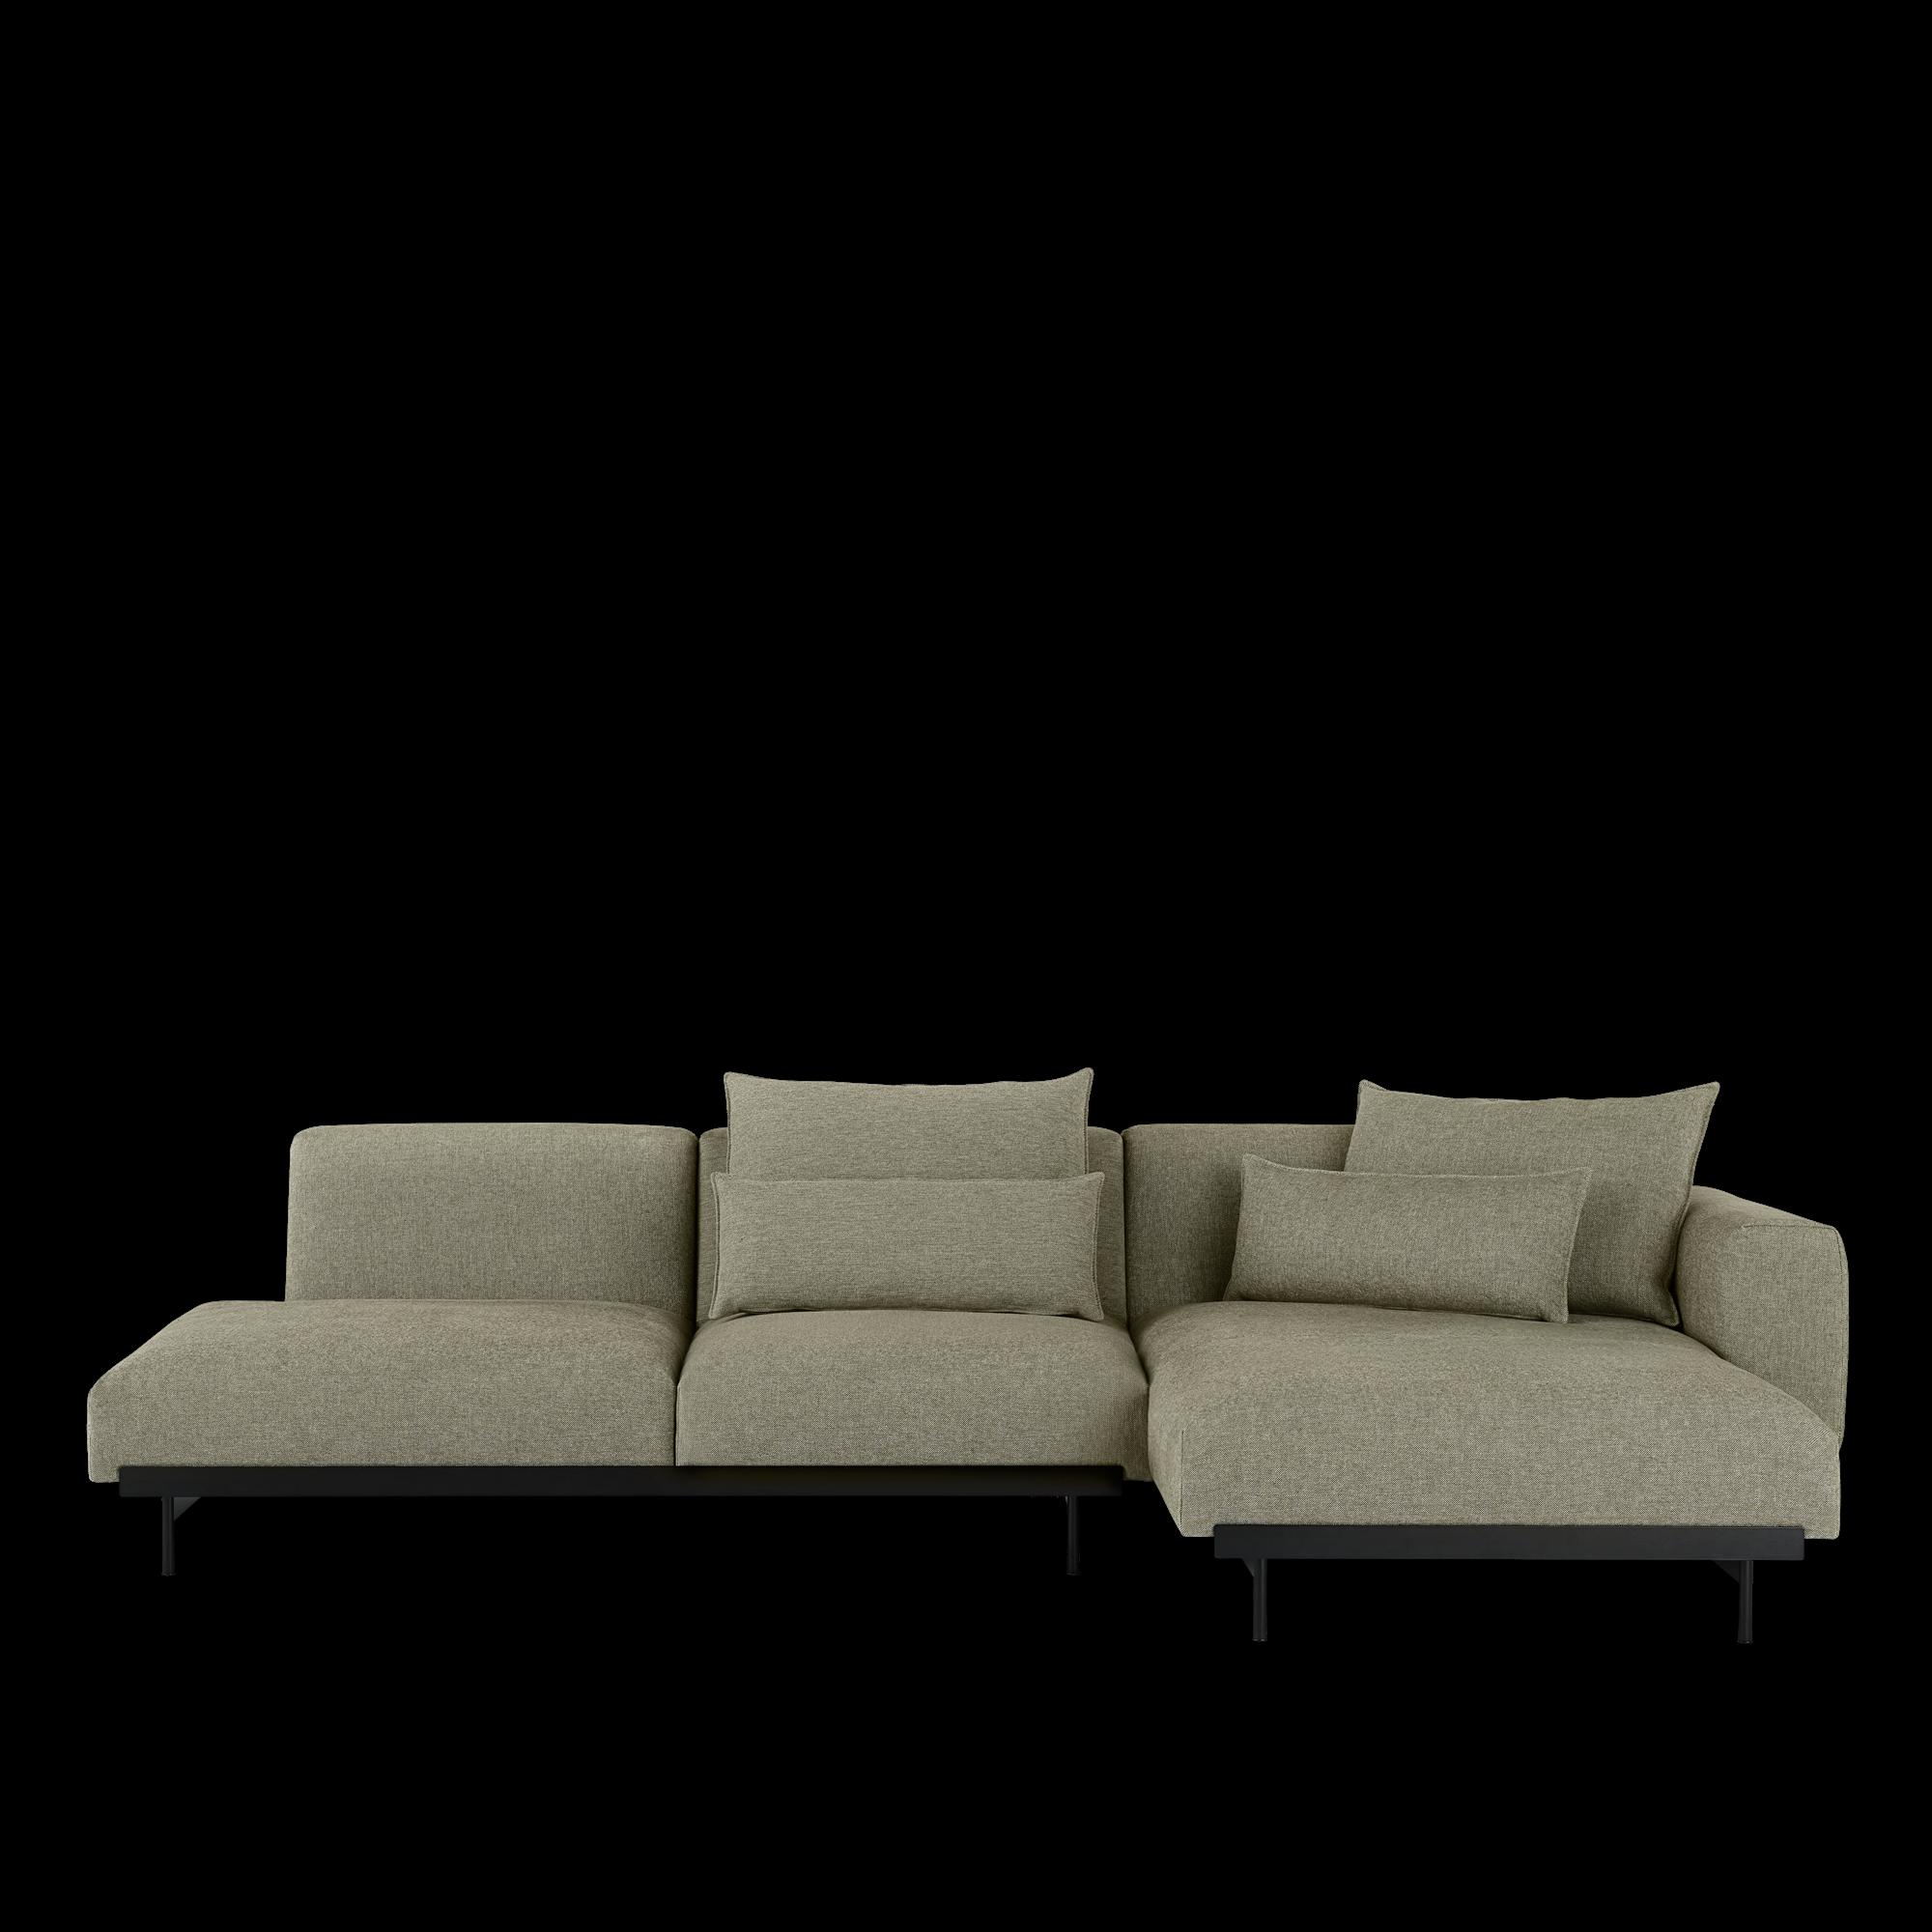 Muuto In Situ Sofa Modular Sofa Scandinavian Sofas Scandinavian Sofa Design